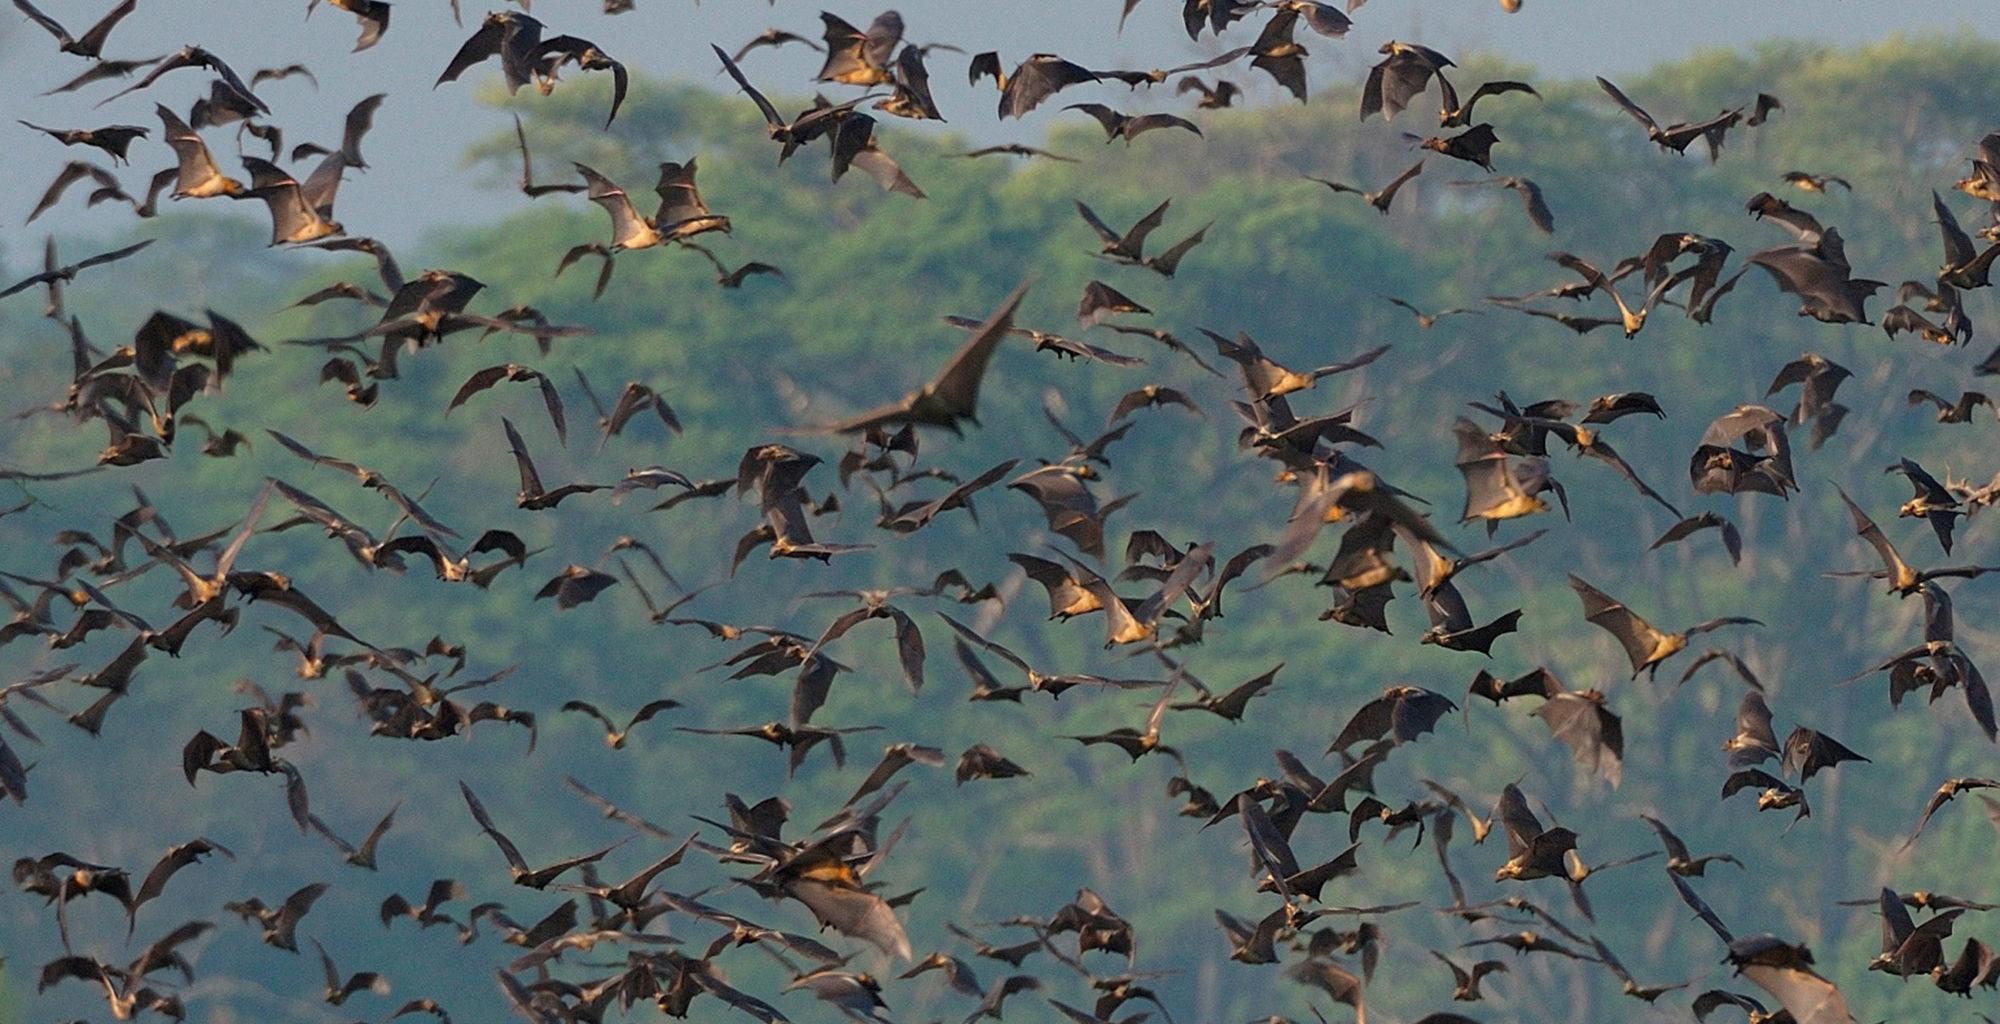 Zambia-Kasanka-National-Park-Bats